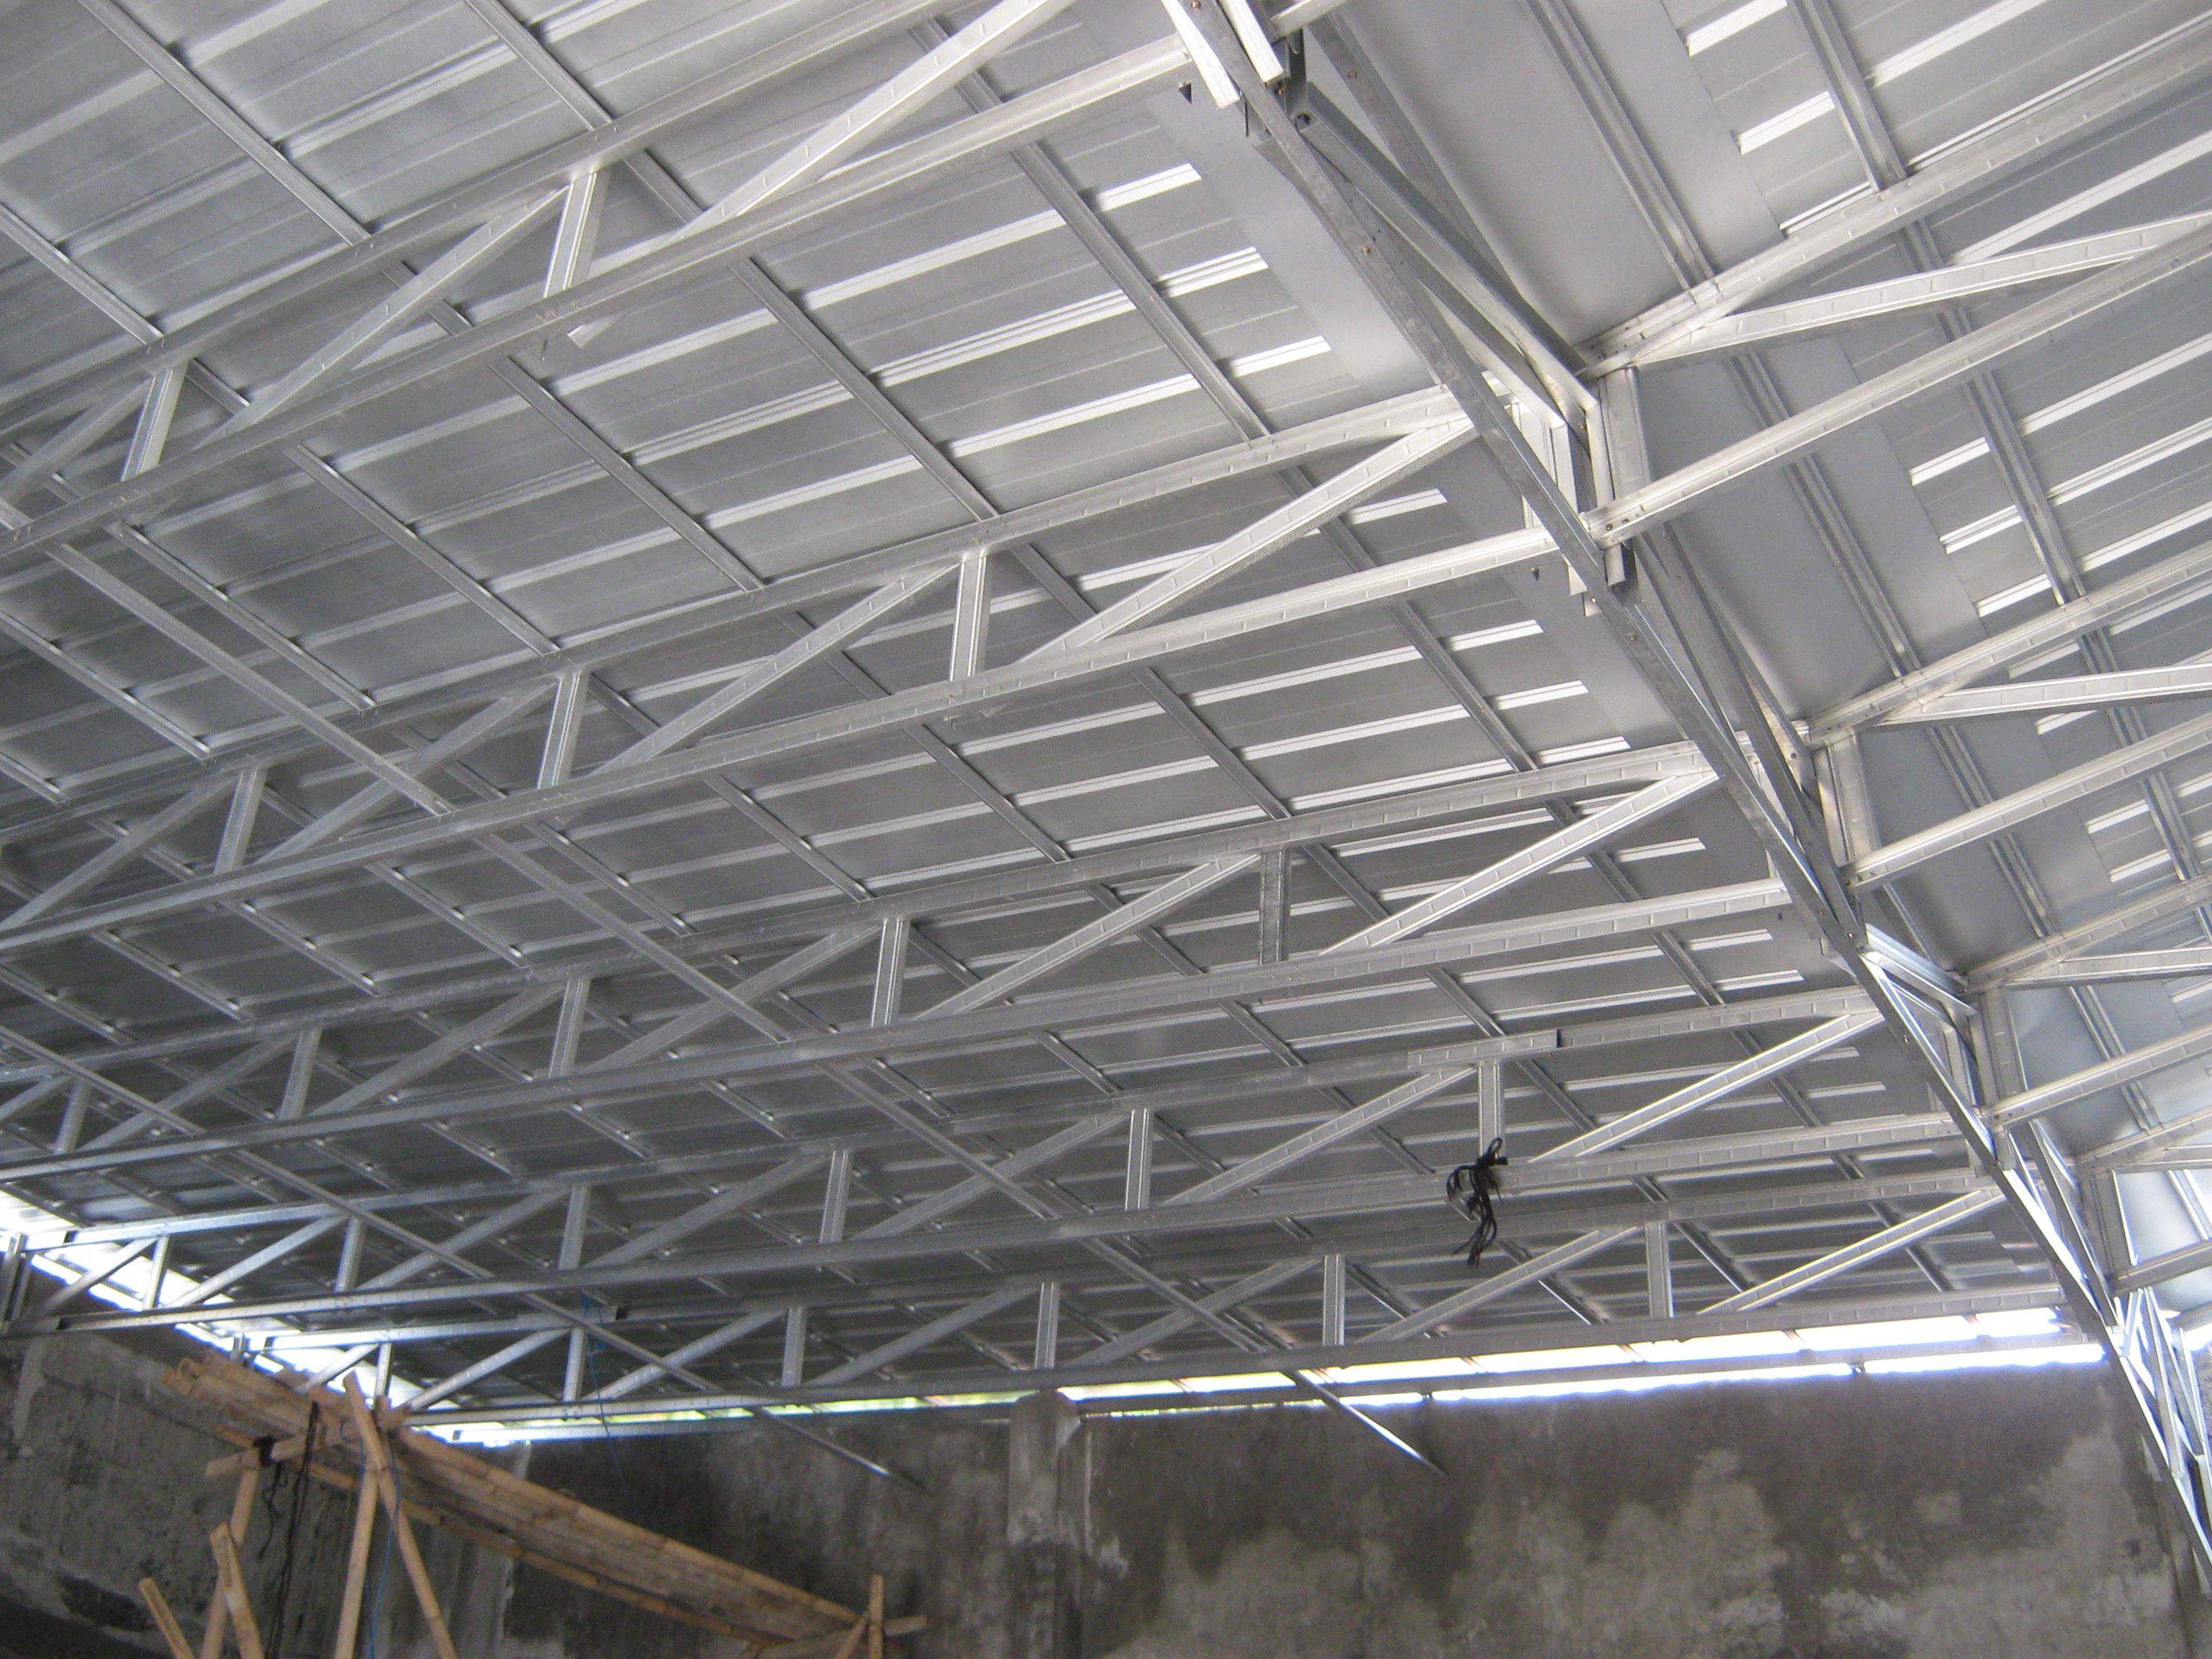 jenis bentuk baja ringan rangka atap | tecnodesignsteel